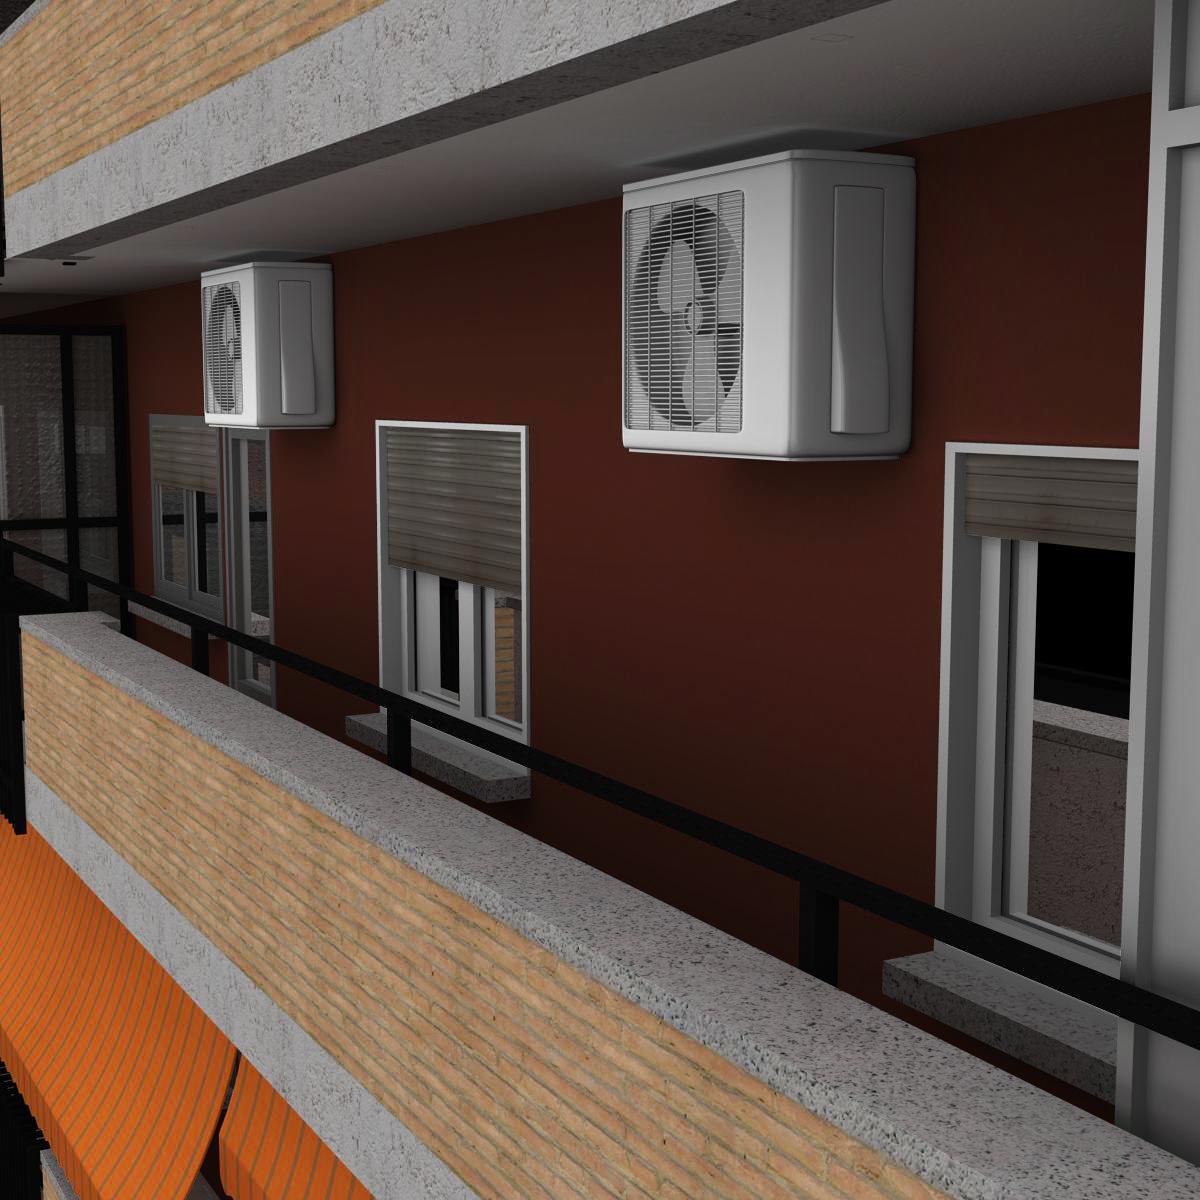 typical spanish building 3d model 3ds max fbx c4d ma mb obj 159489